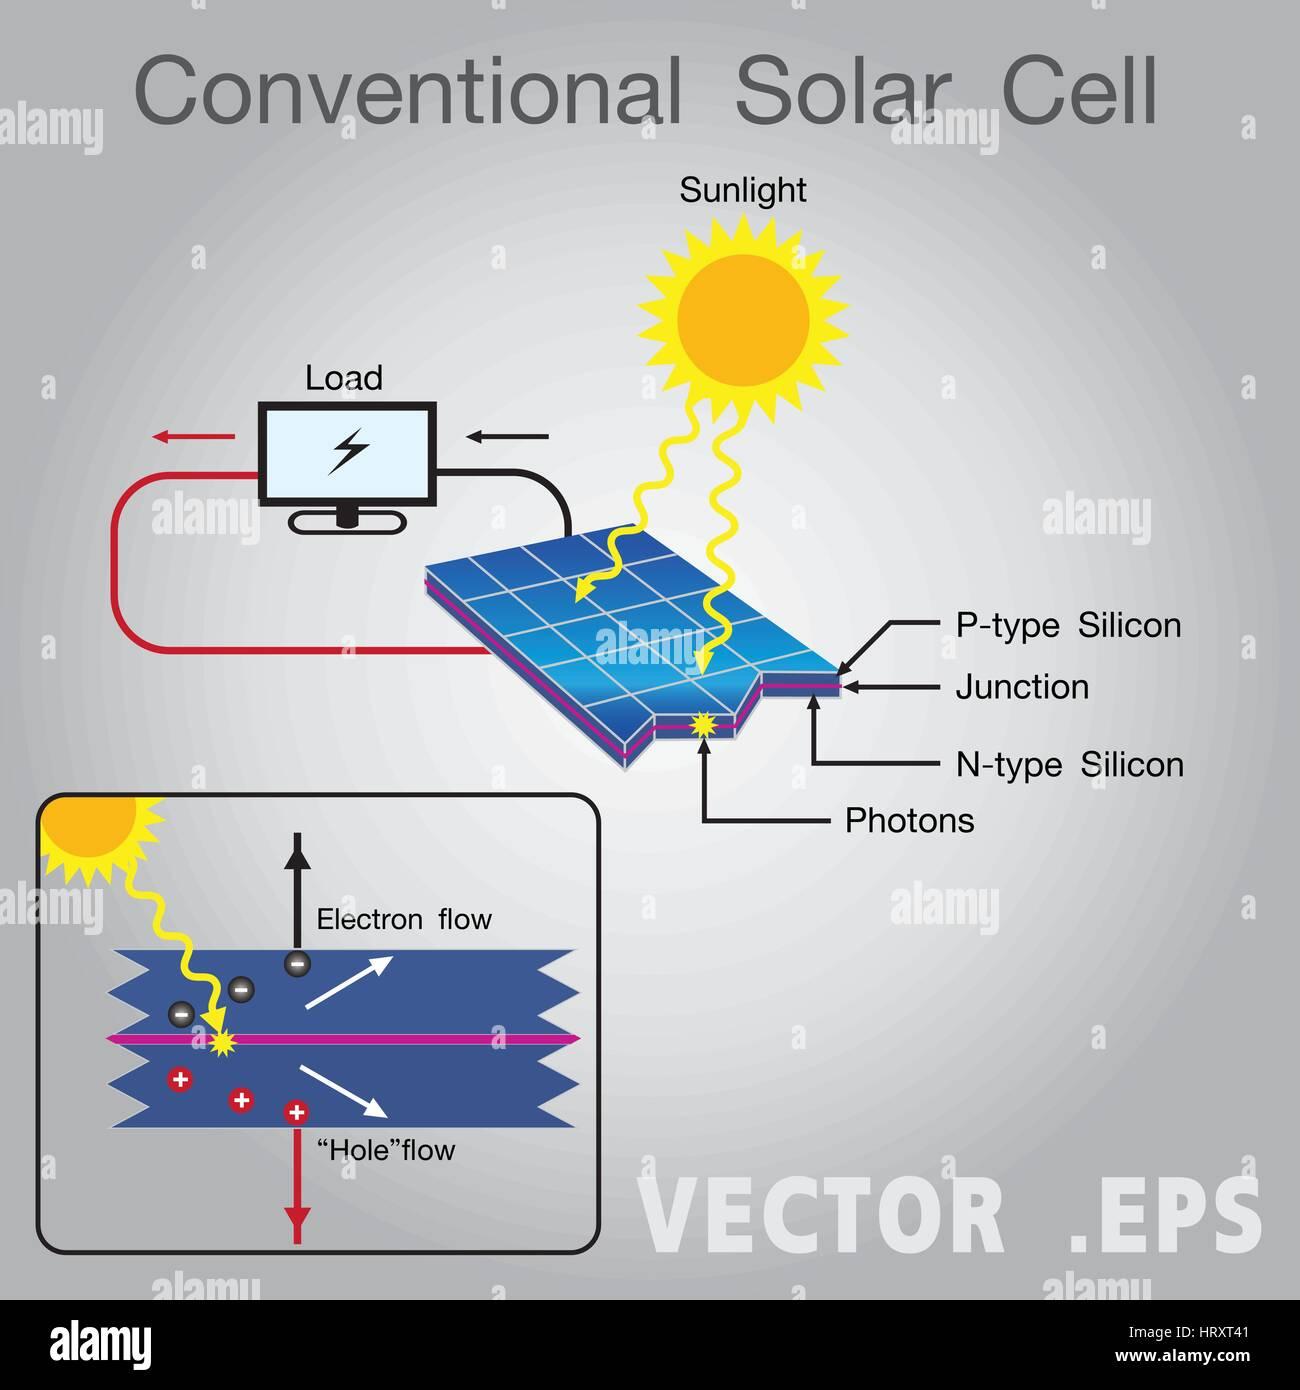 conventional solar cell diagram vector stock vector art rh alamy com solar cell working diagram solar cell diagram pdf